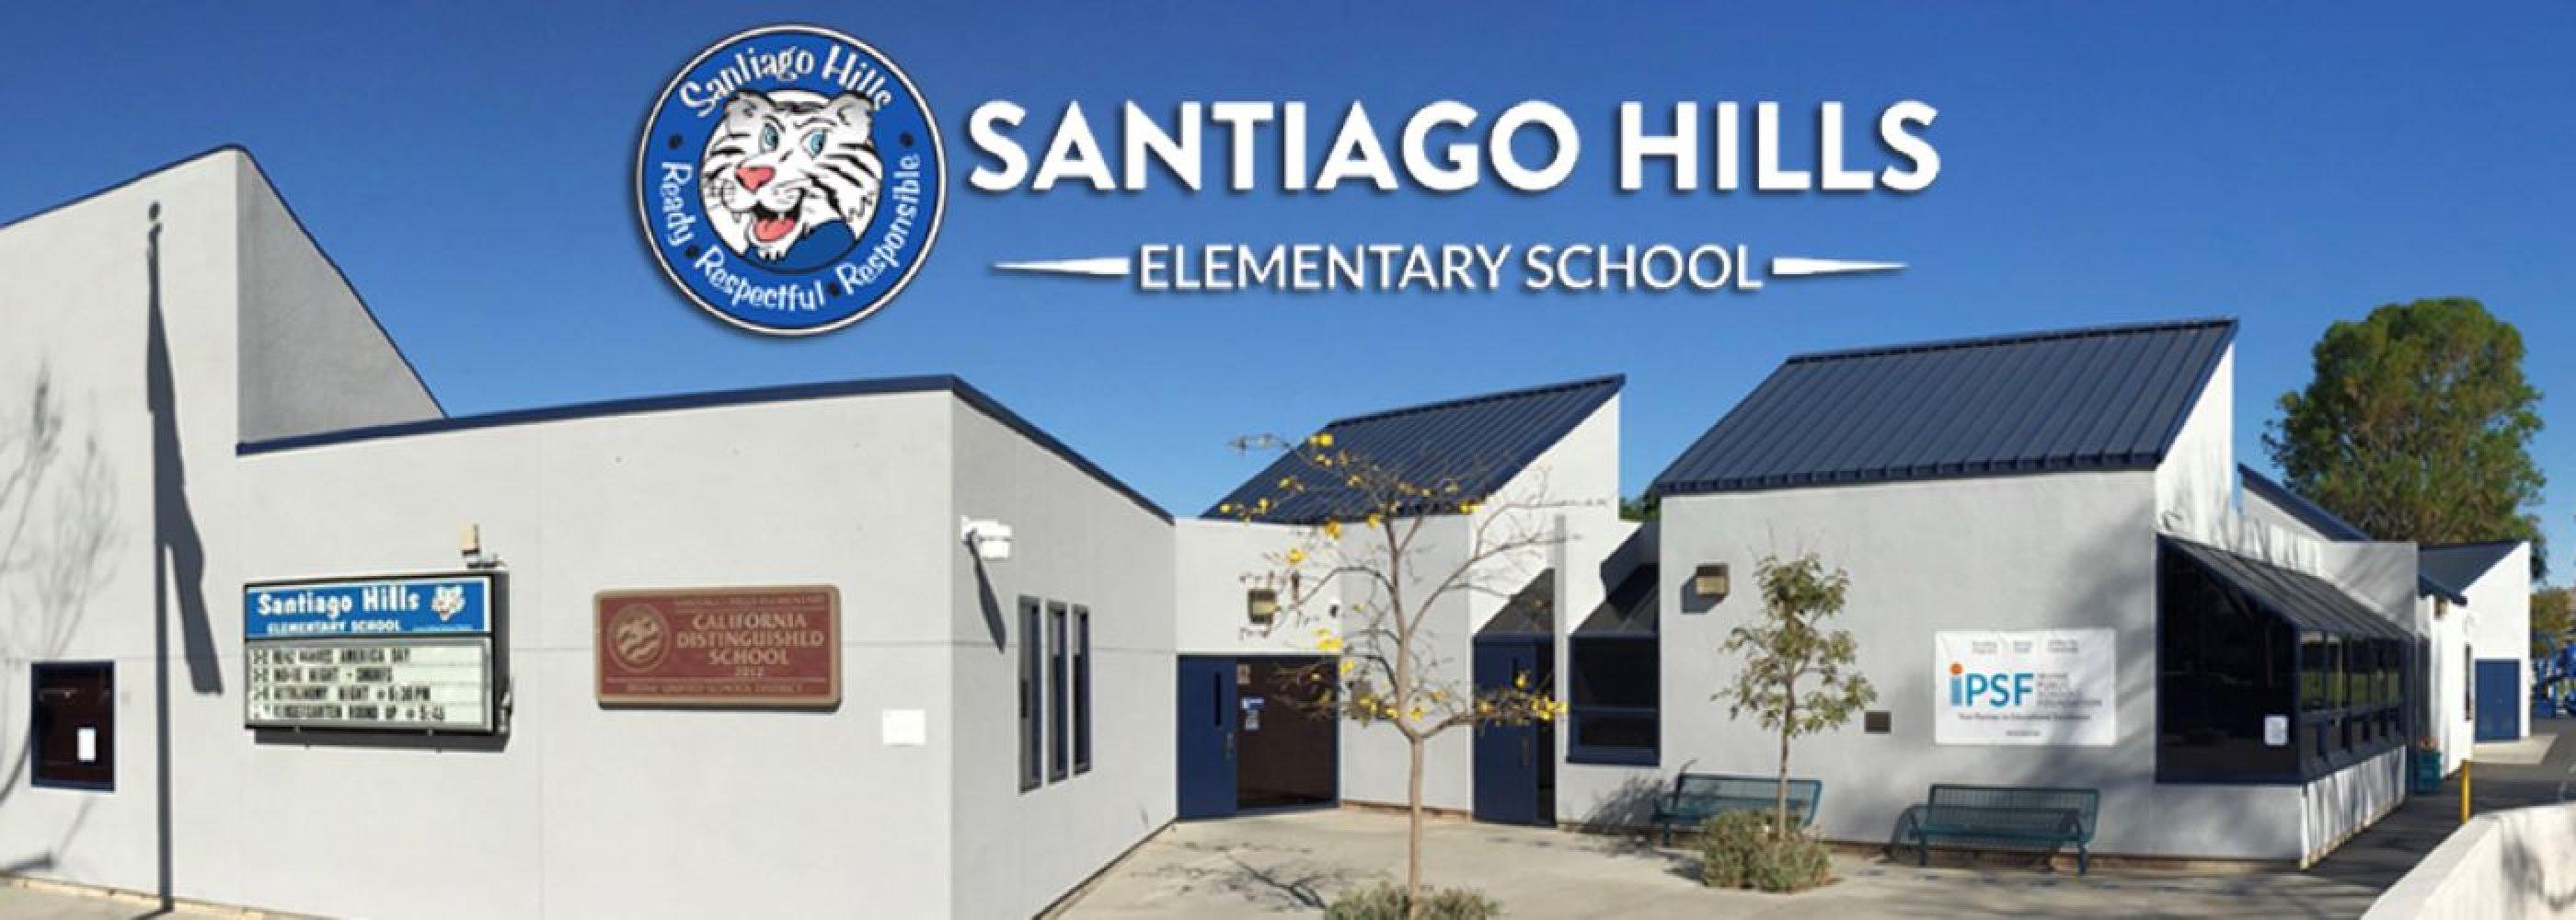 Santiago Hills front